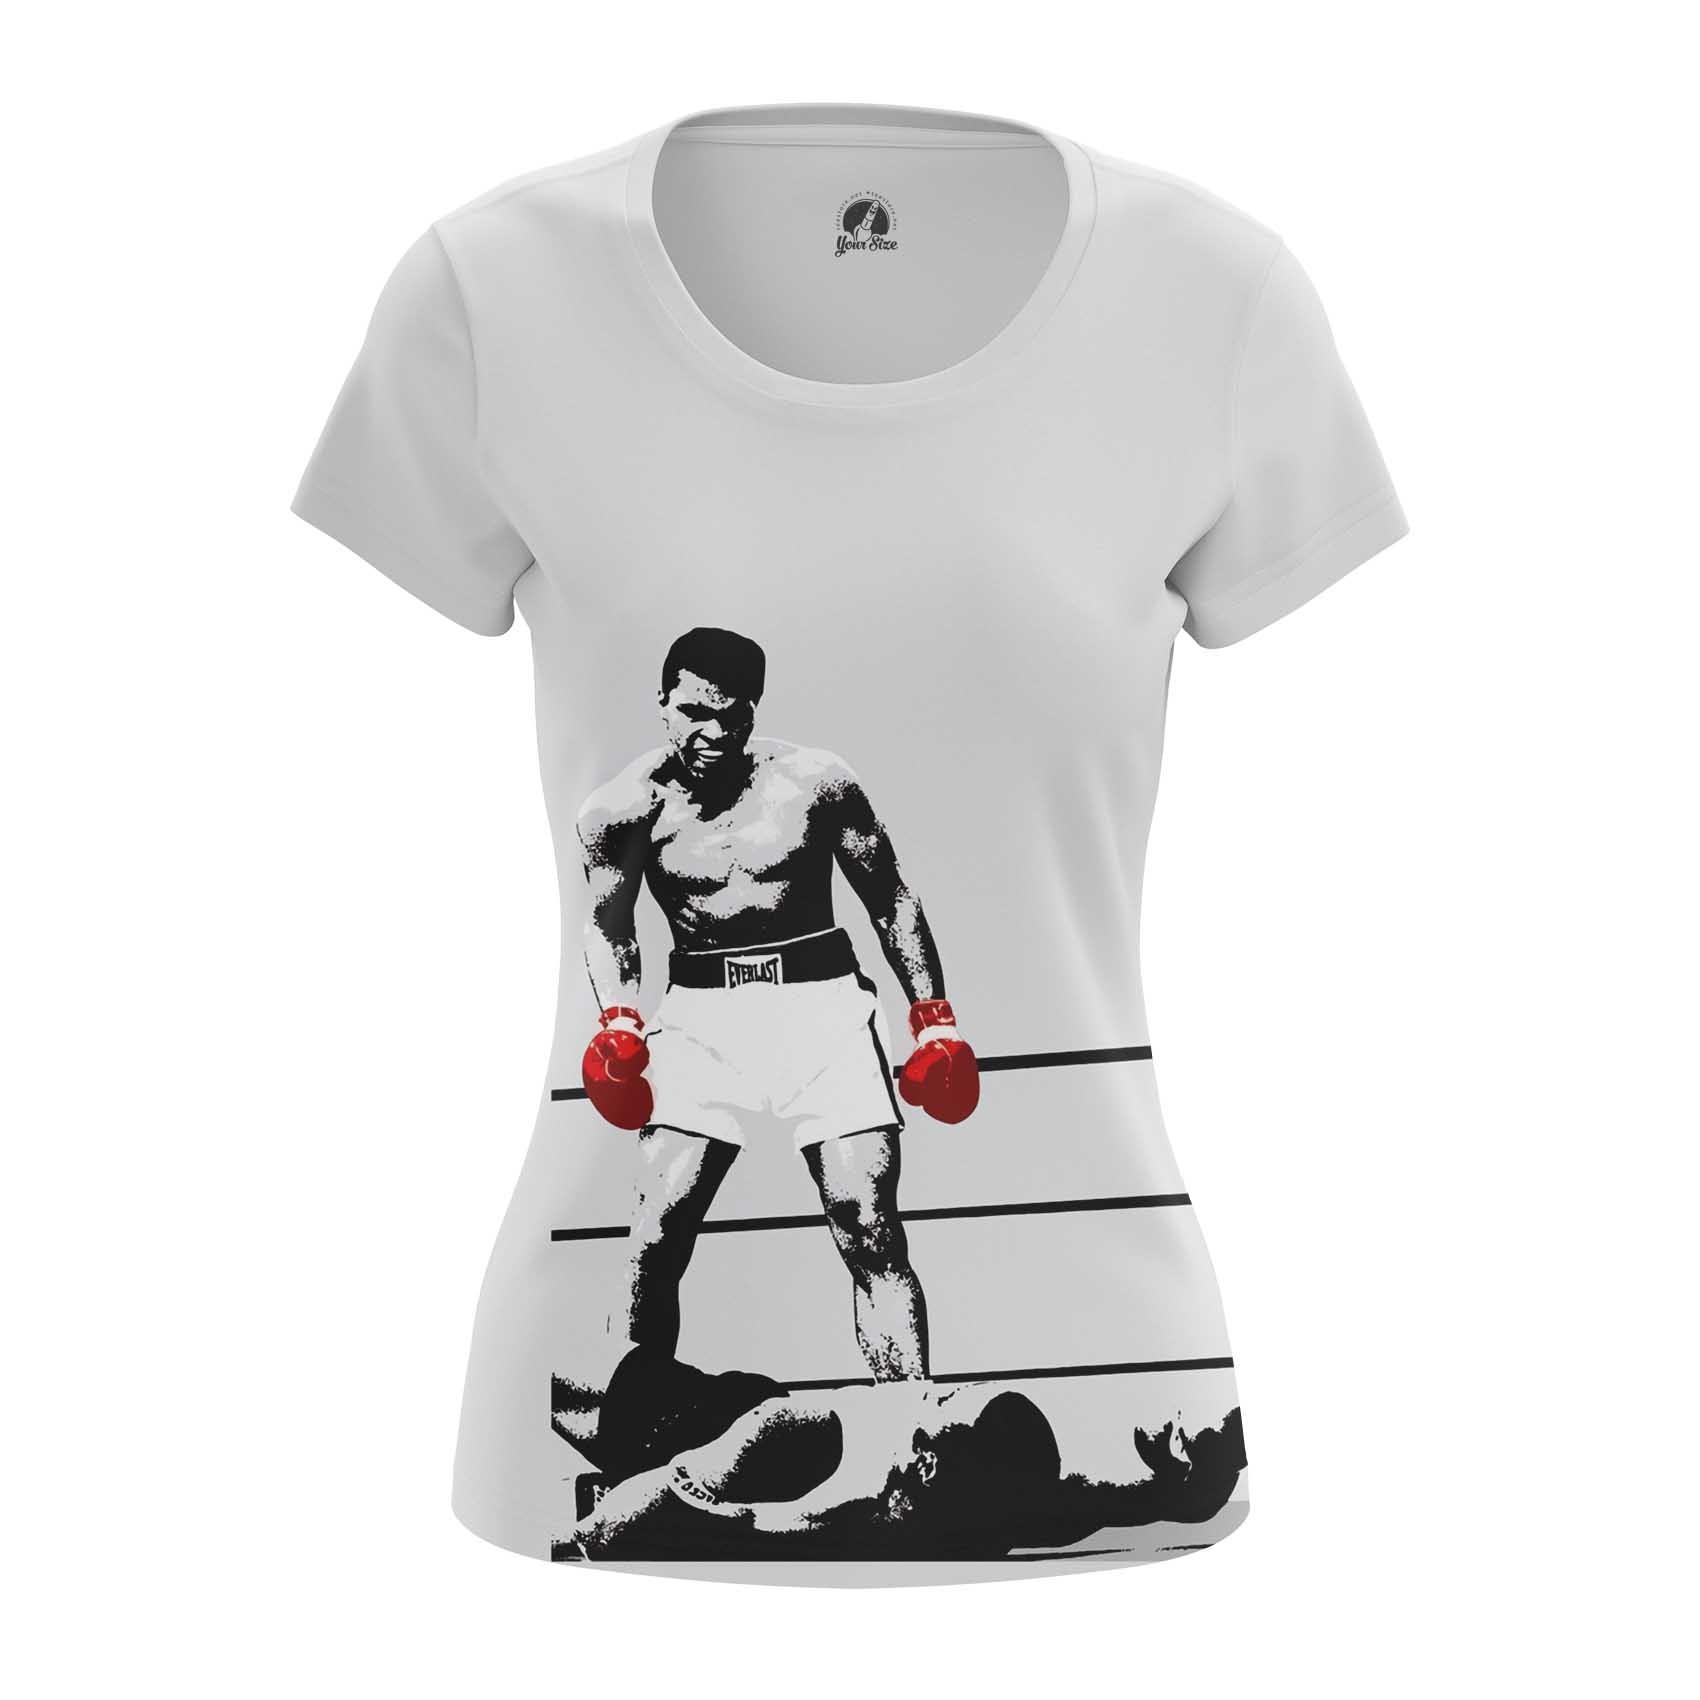 Merchandise Women'S T-Shirt Champion Muhammad Ali Top